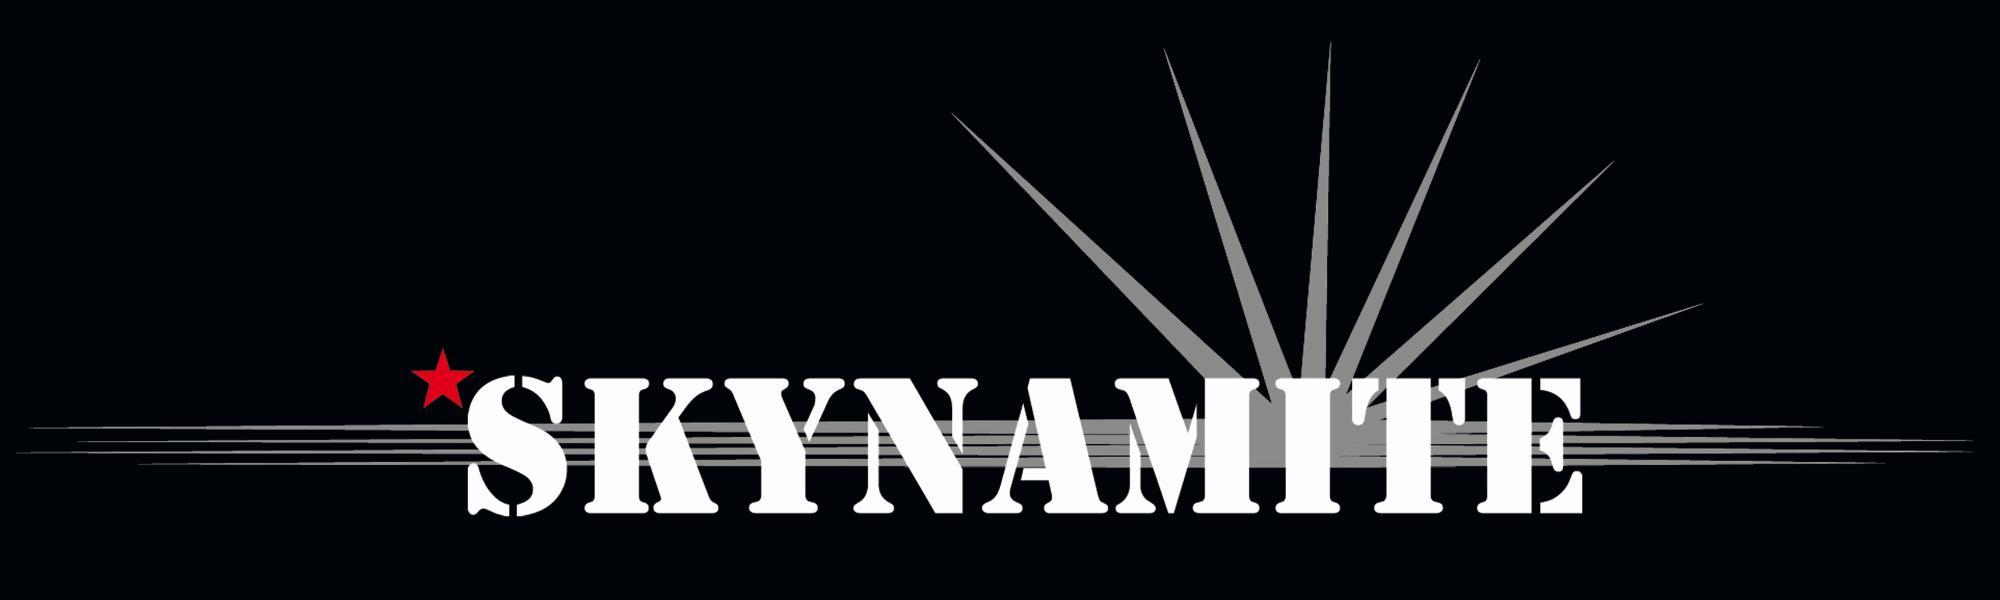 SKYNAMITE - FSZ SAAR